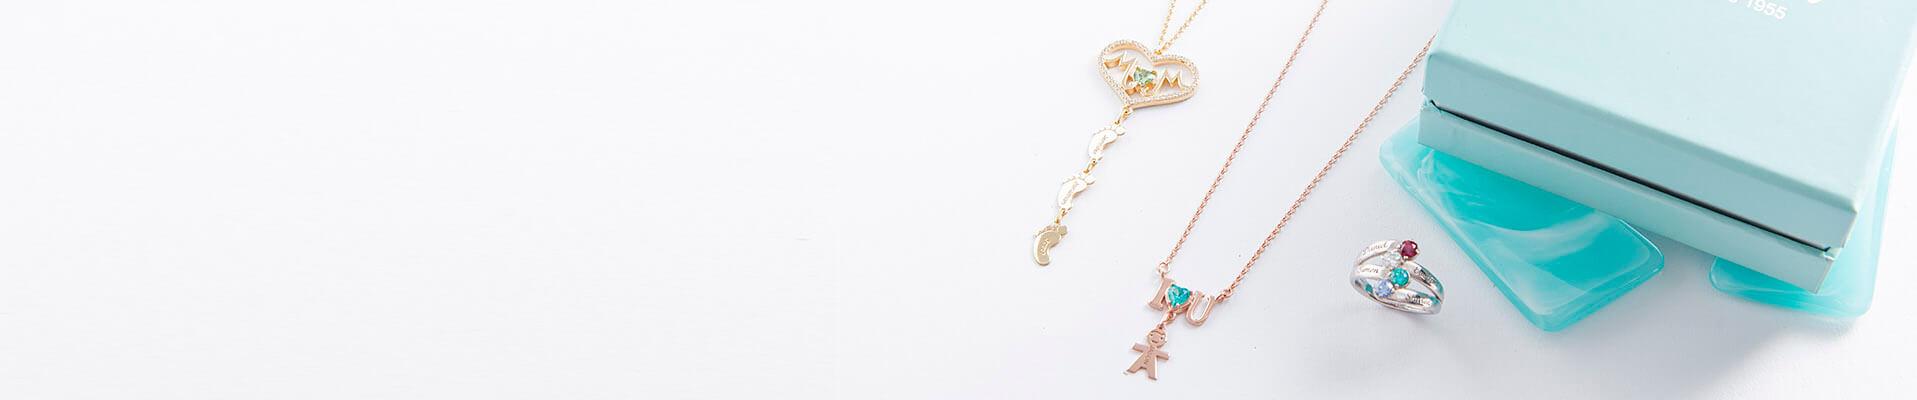 Birthstones jewelry mom web banner